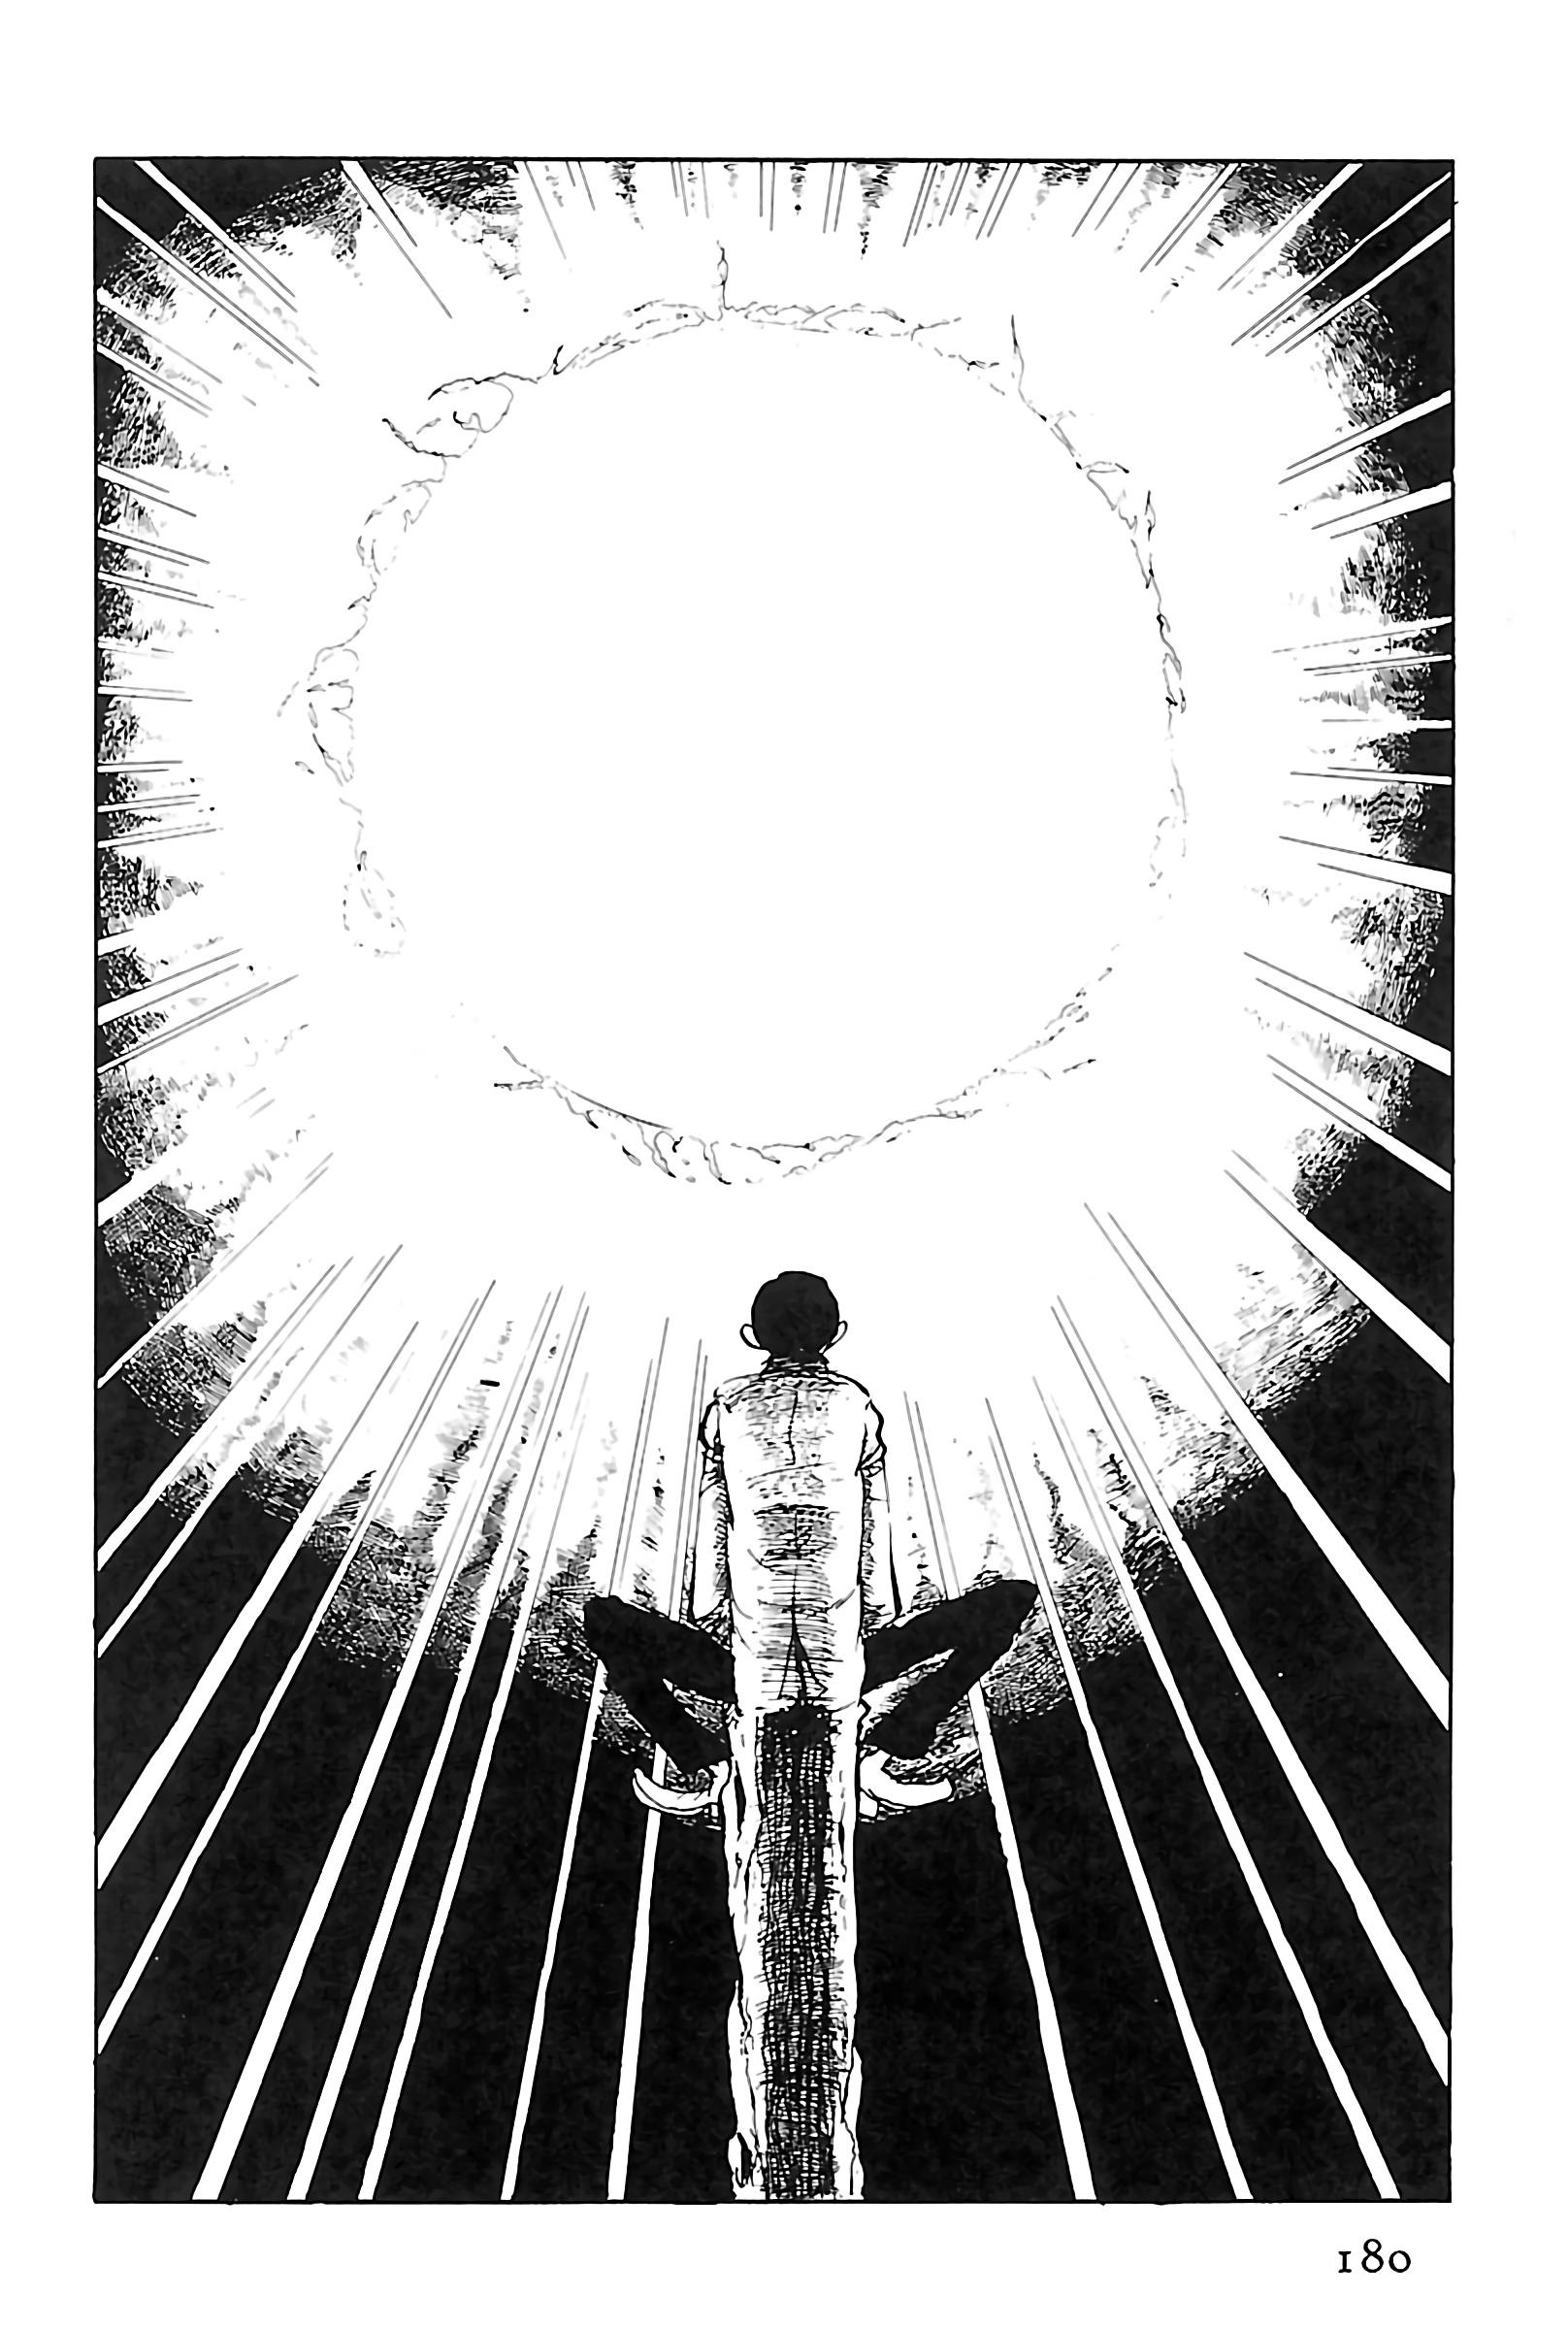 Lupin Iii: World'S Most Wanted Vol.11 Chapter 124: Happy New Year, Lupin! page 2 - Mangakakalots.com